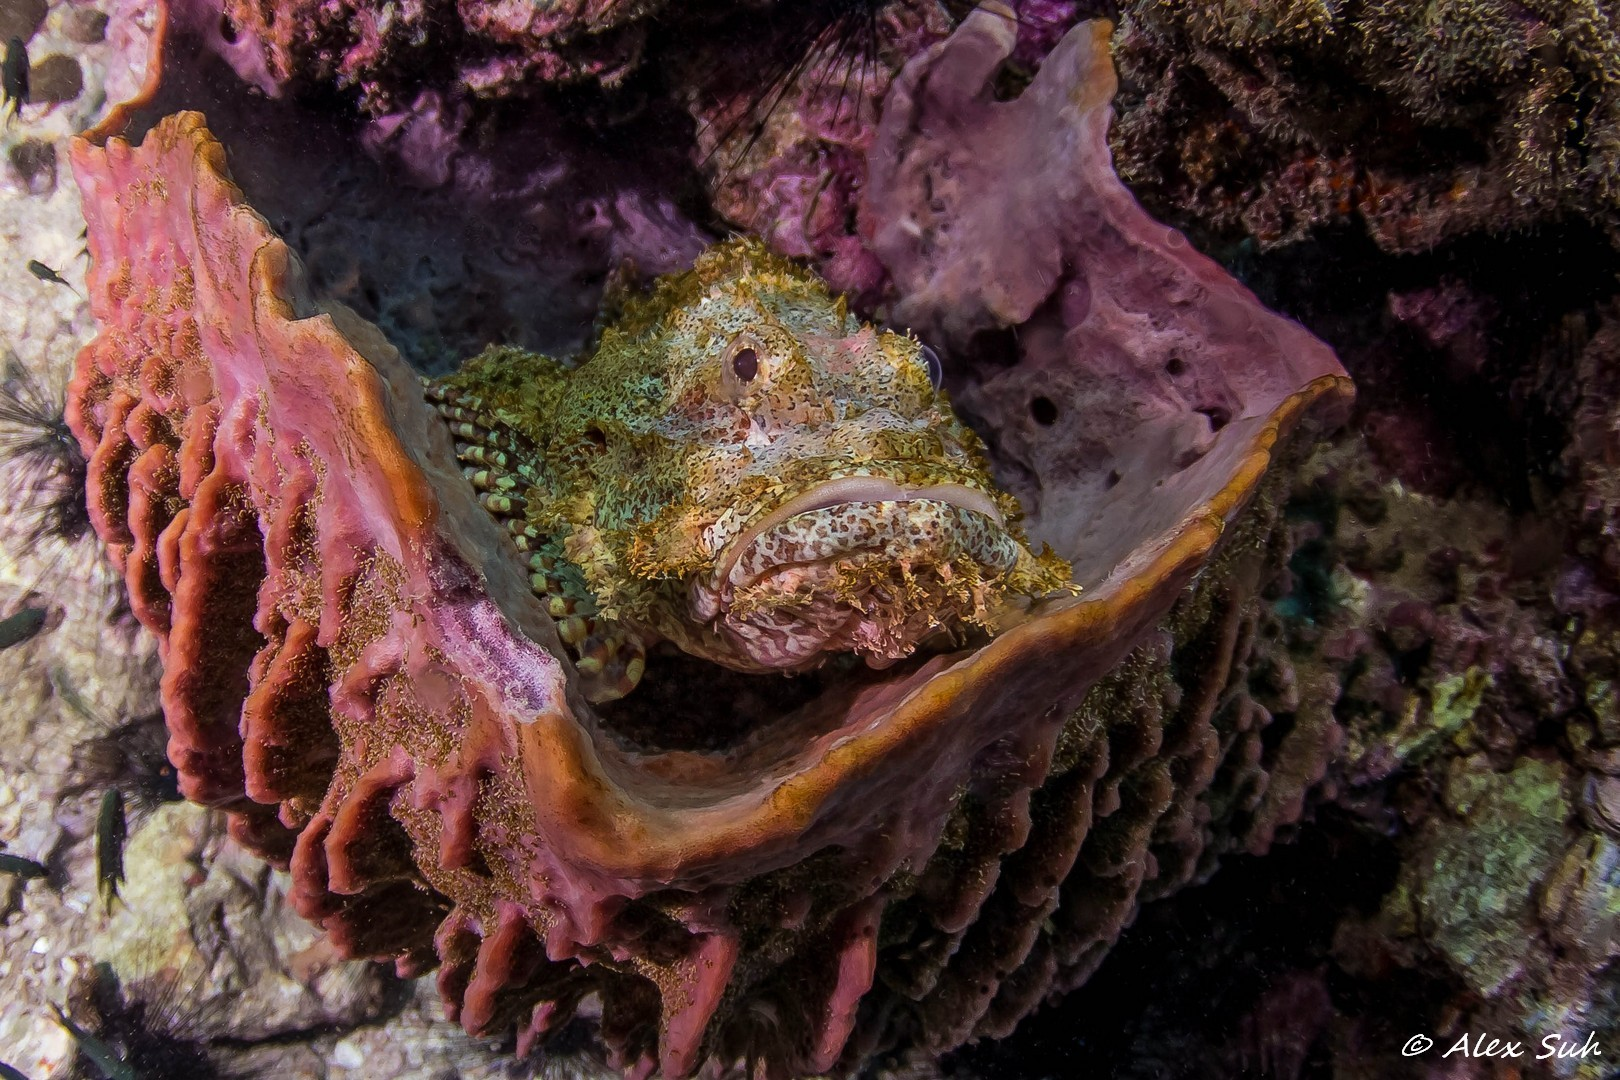 Giant Sculpin Fish